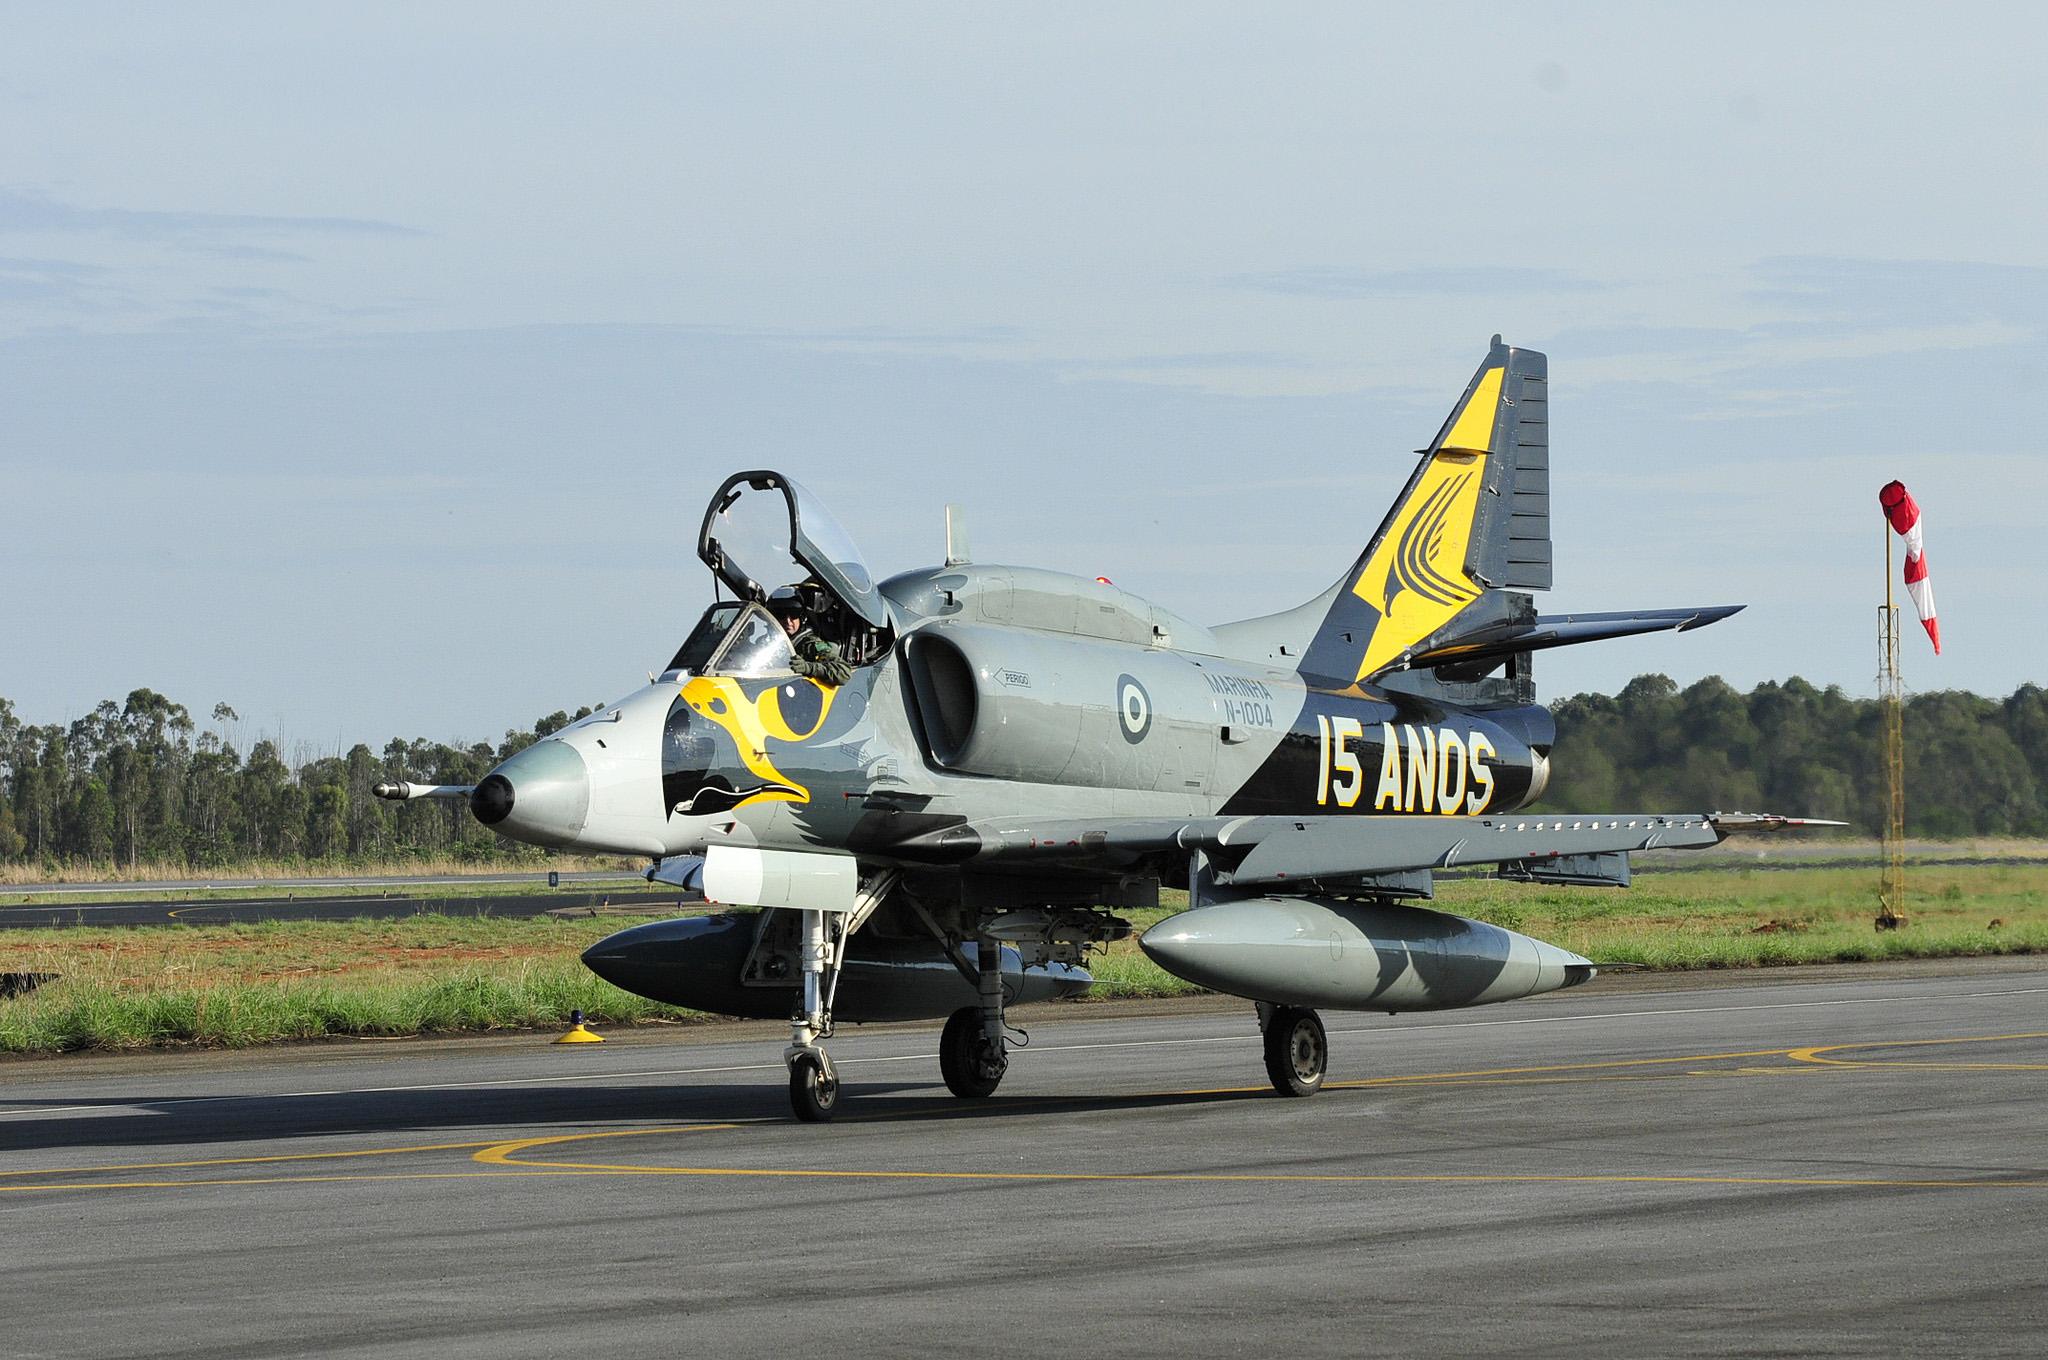 VF-1 15 anos